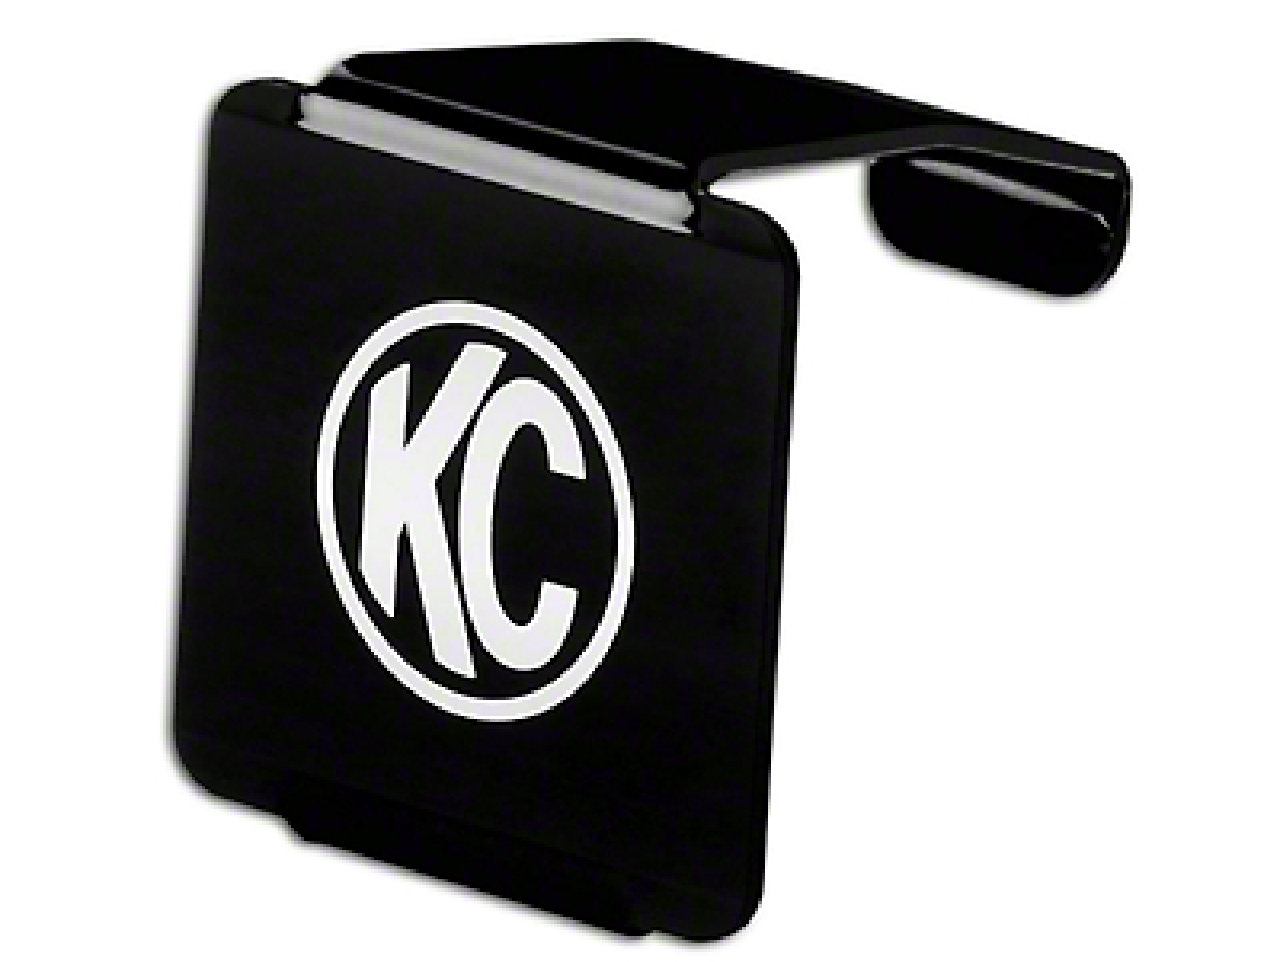 KC HiLiTES Hard Cover for 3 in. LZR Cube Light - Black (87-18 Wrangler YJ, TJ, JK & JL)